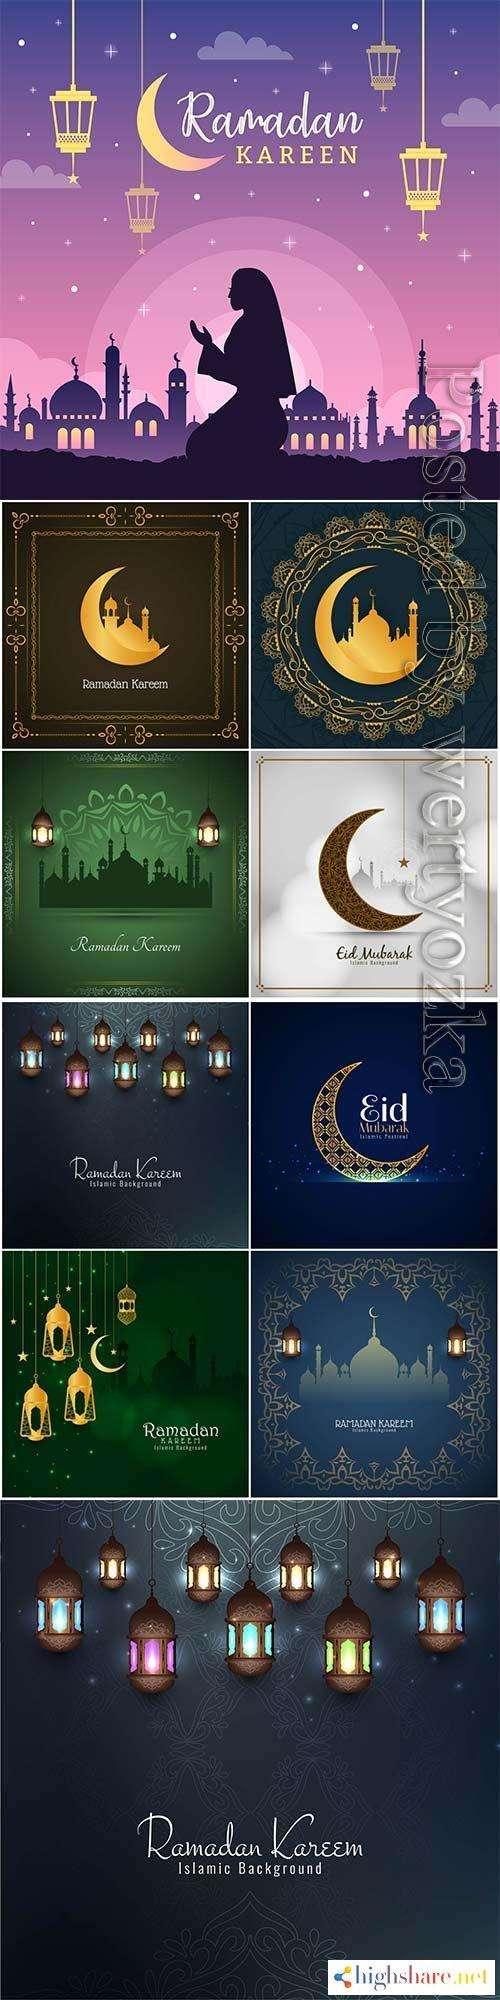 ramadan design vector background 5f438307c3a94 - Ramadan design vector background